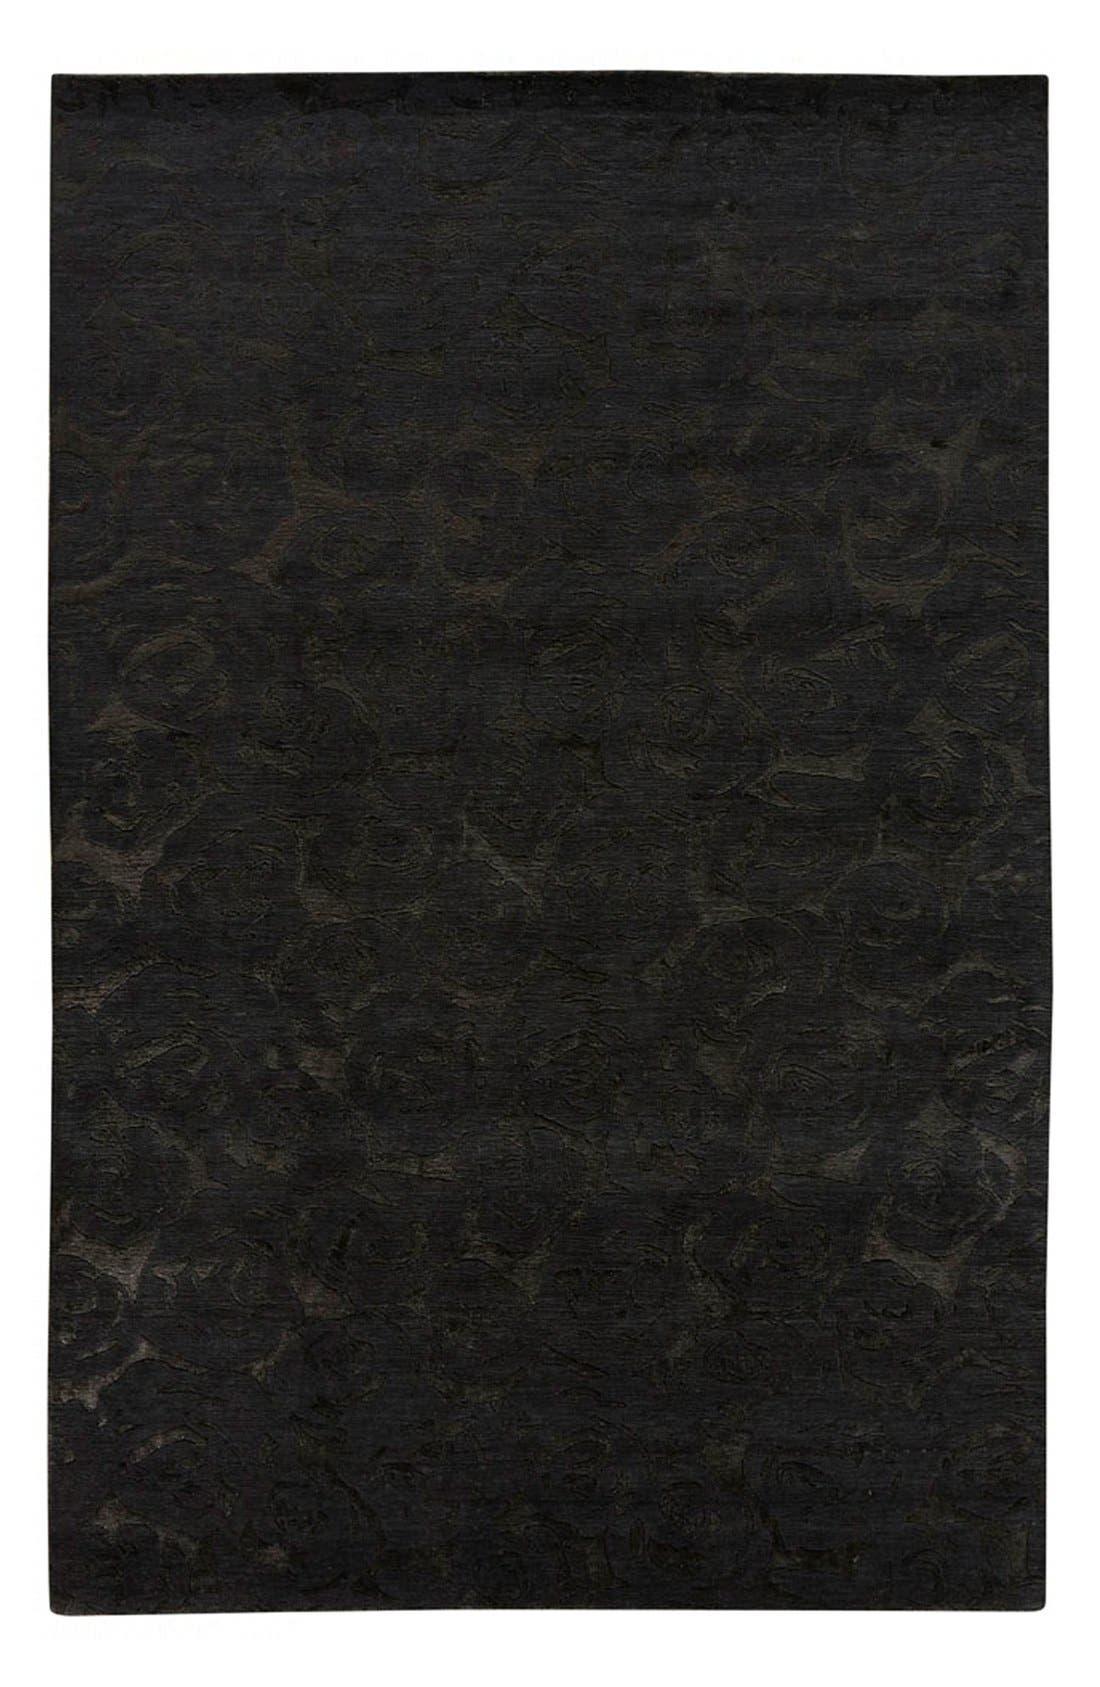 'noho' premium wool blend rug,                             Main thumbnail 1, color,                             001